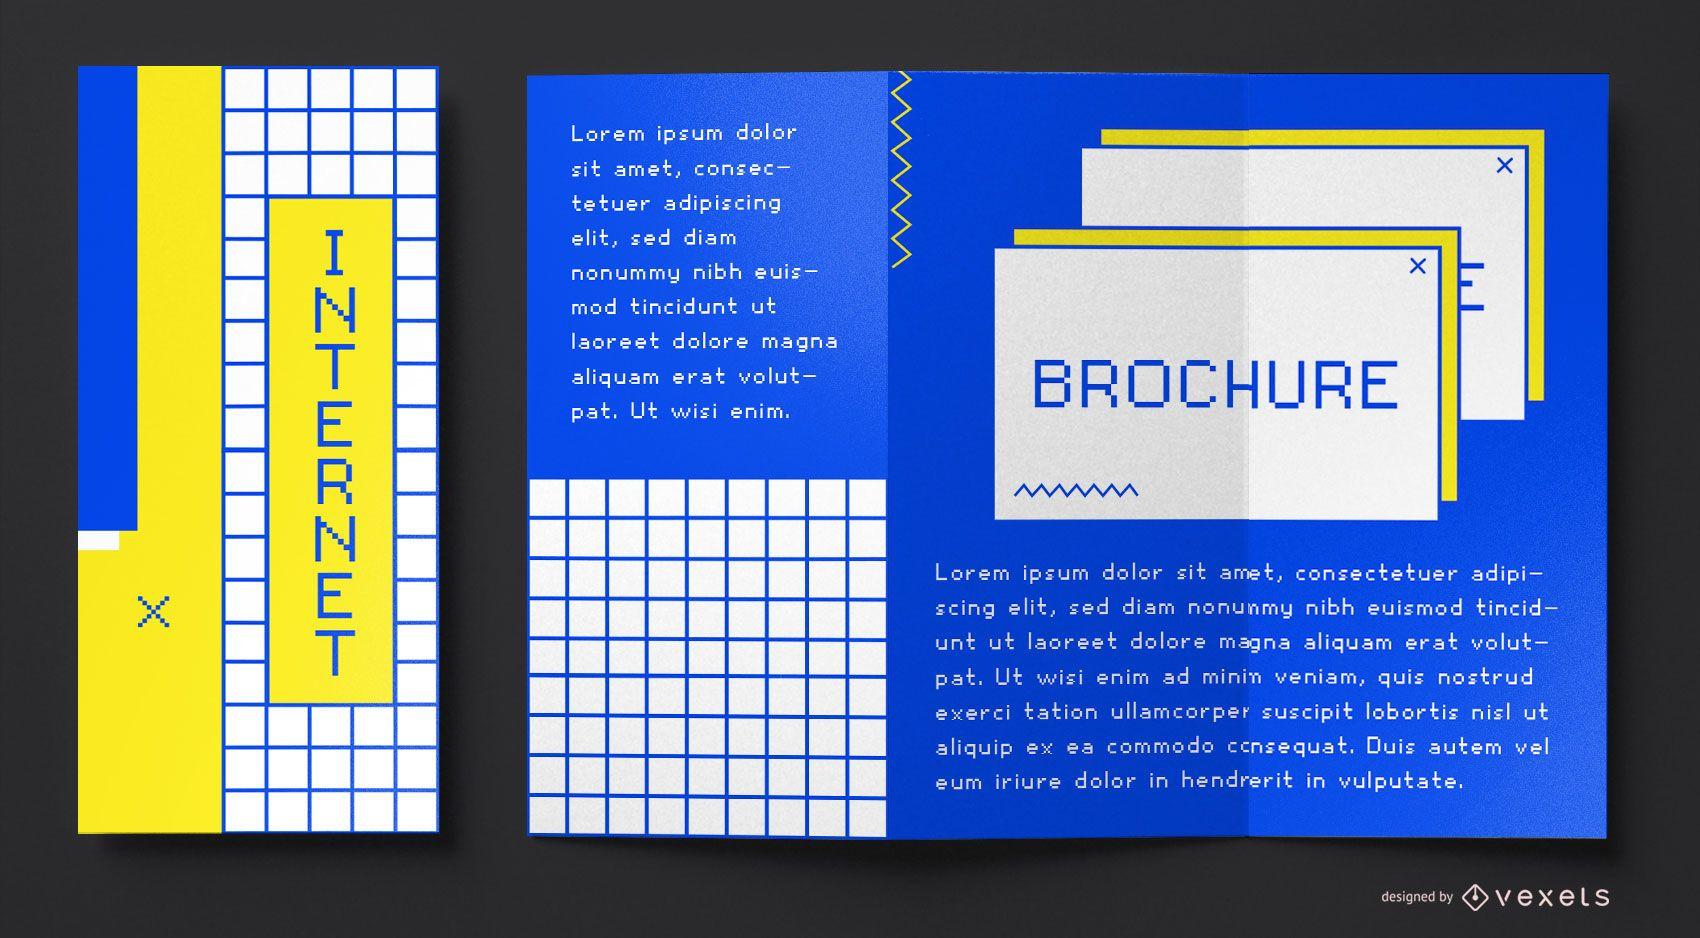 90s internet brochure template